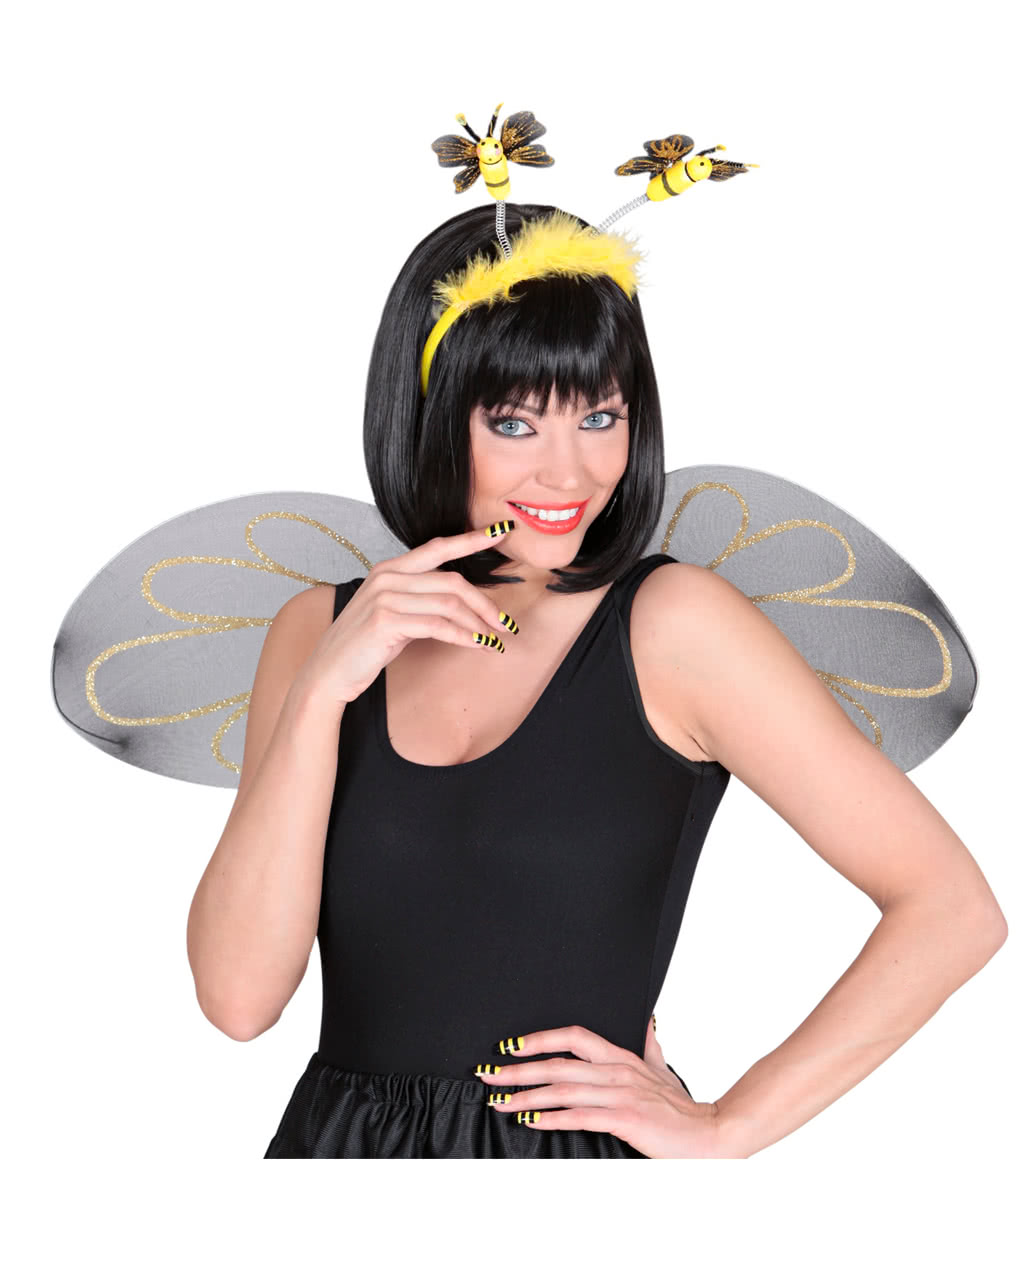 fingernails set bees as costume accessories horror. Black Bedroom Furniture Sets. Home Design Ideas